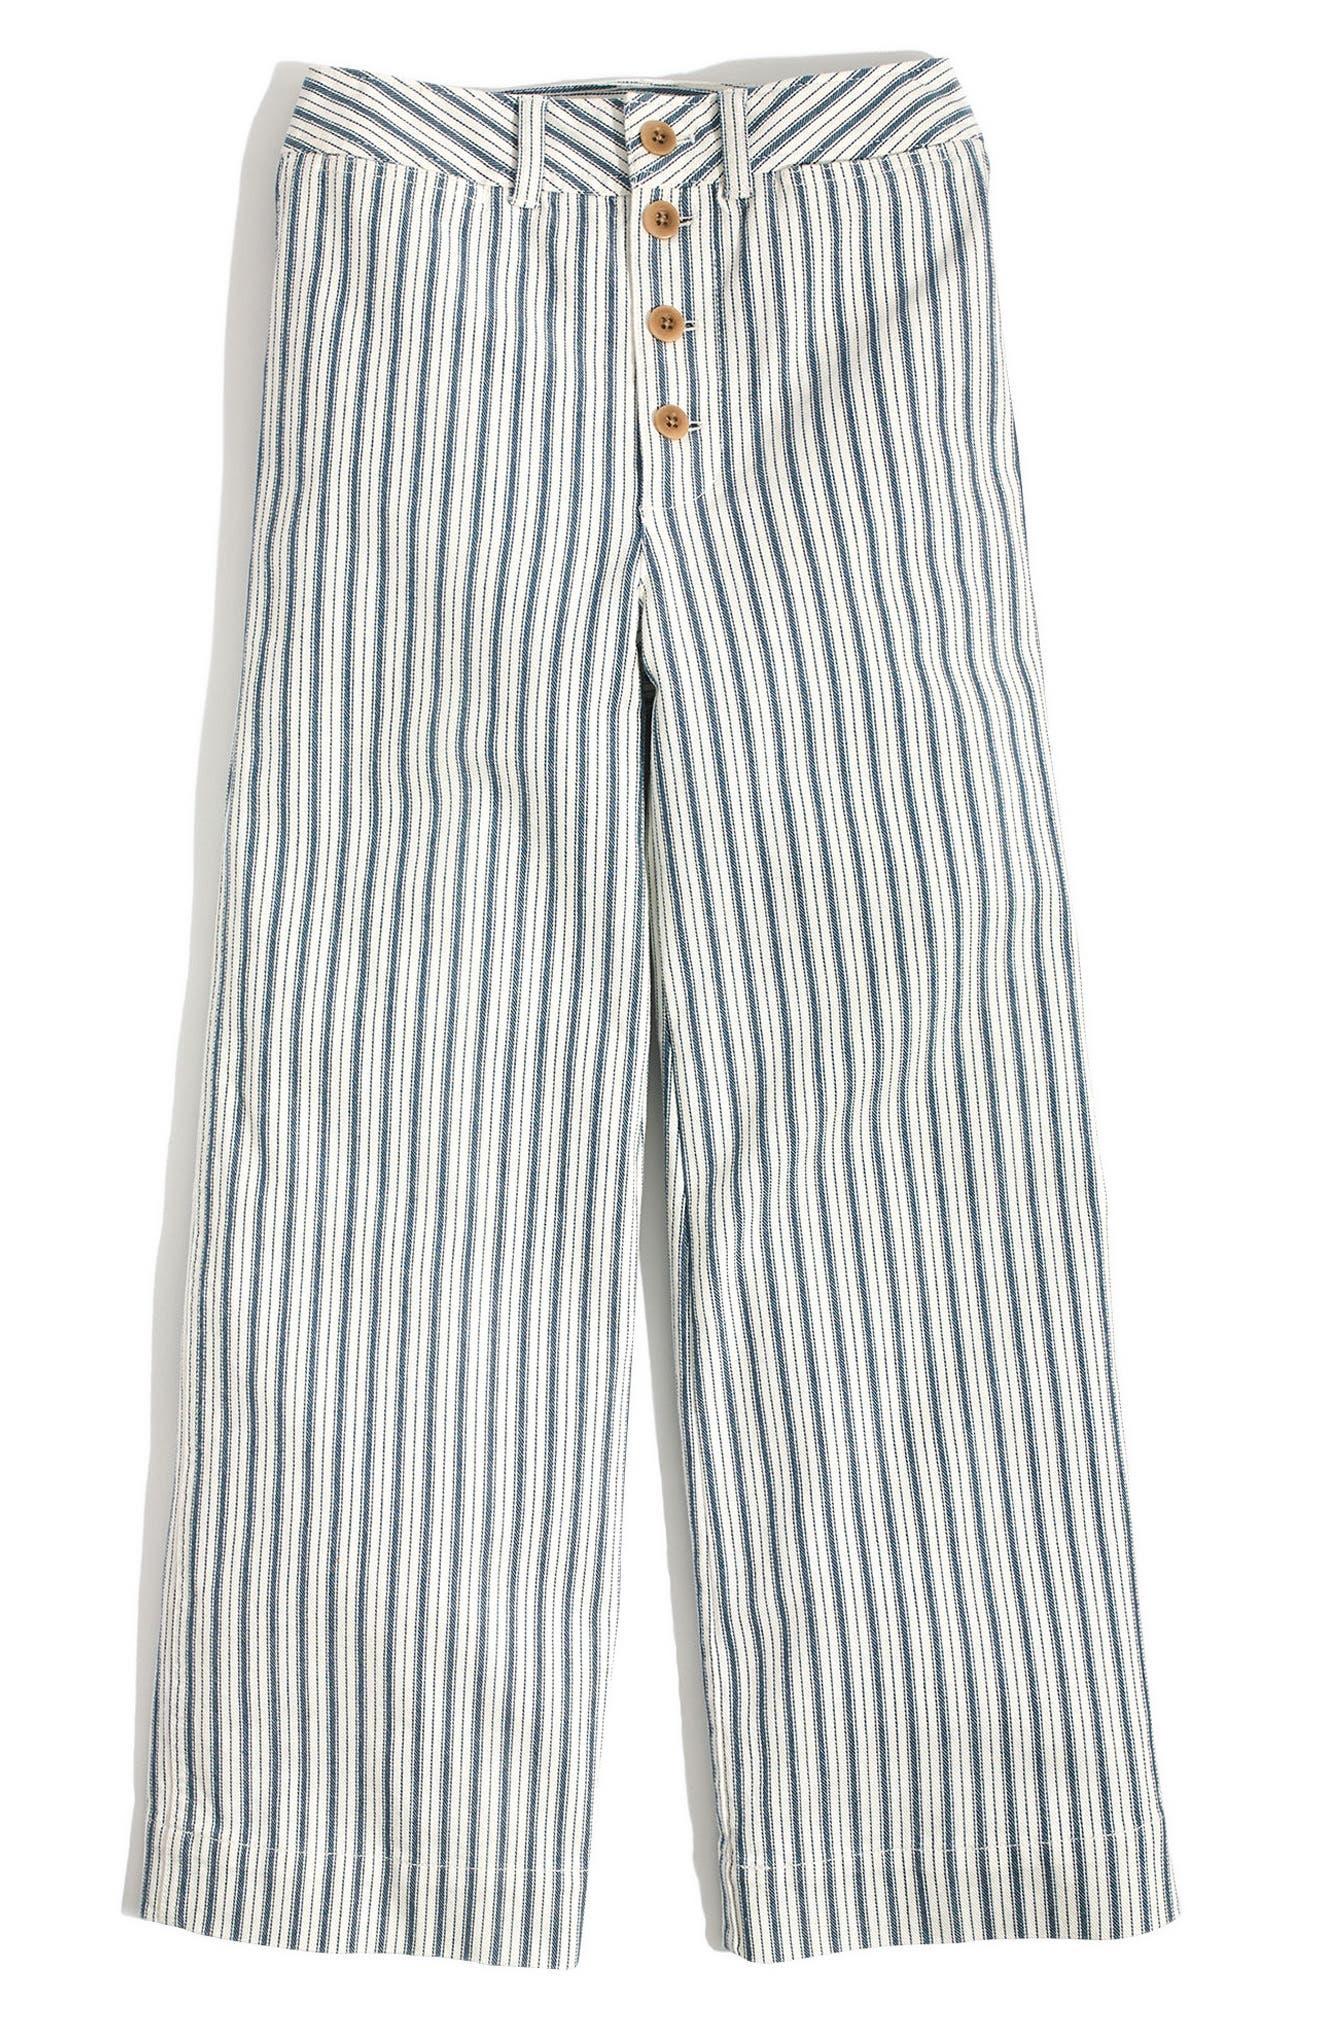 Emmett Stripe Crop Wide Leg Pants,                             Alternate thumbnail 3, color,                             400